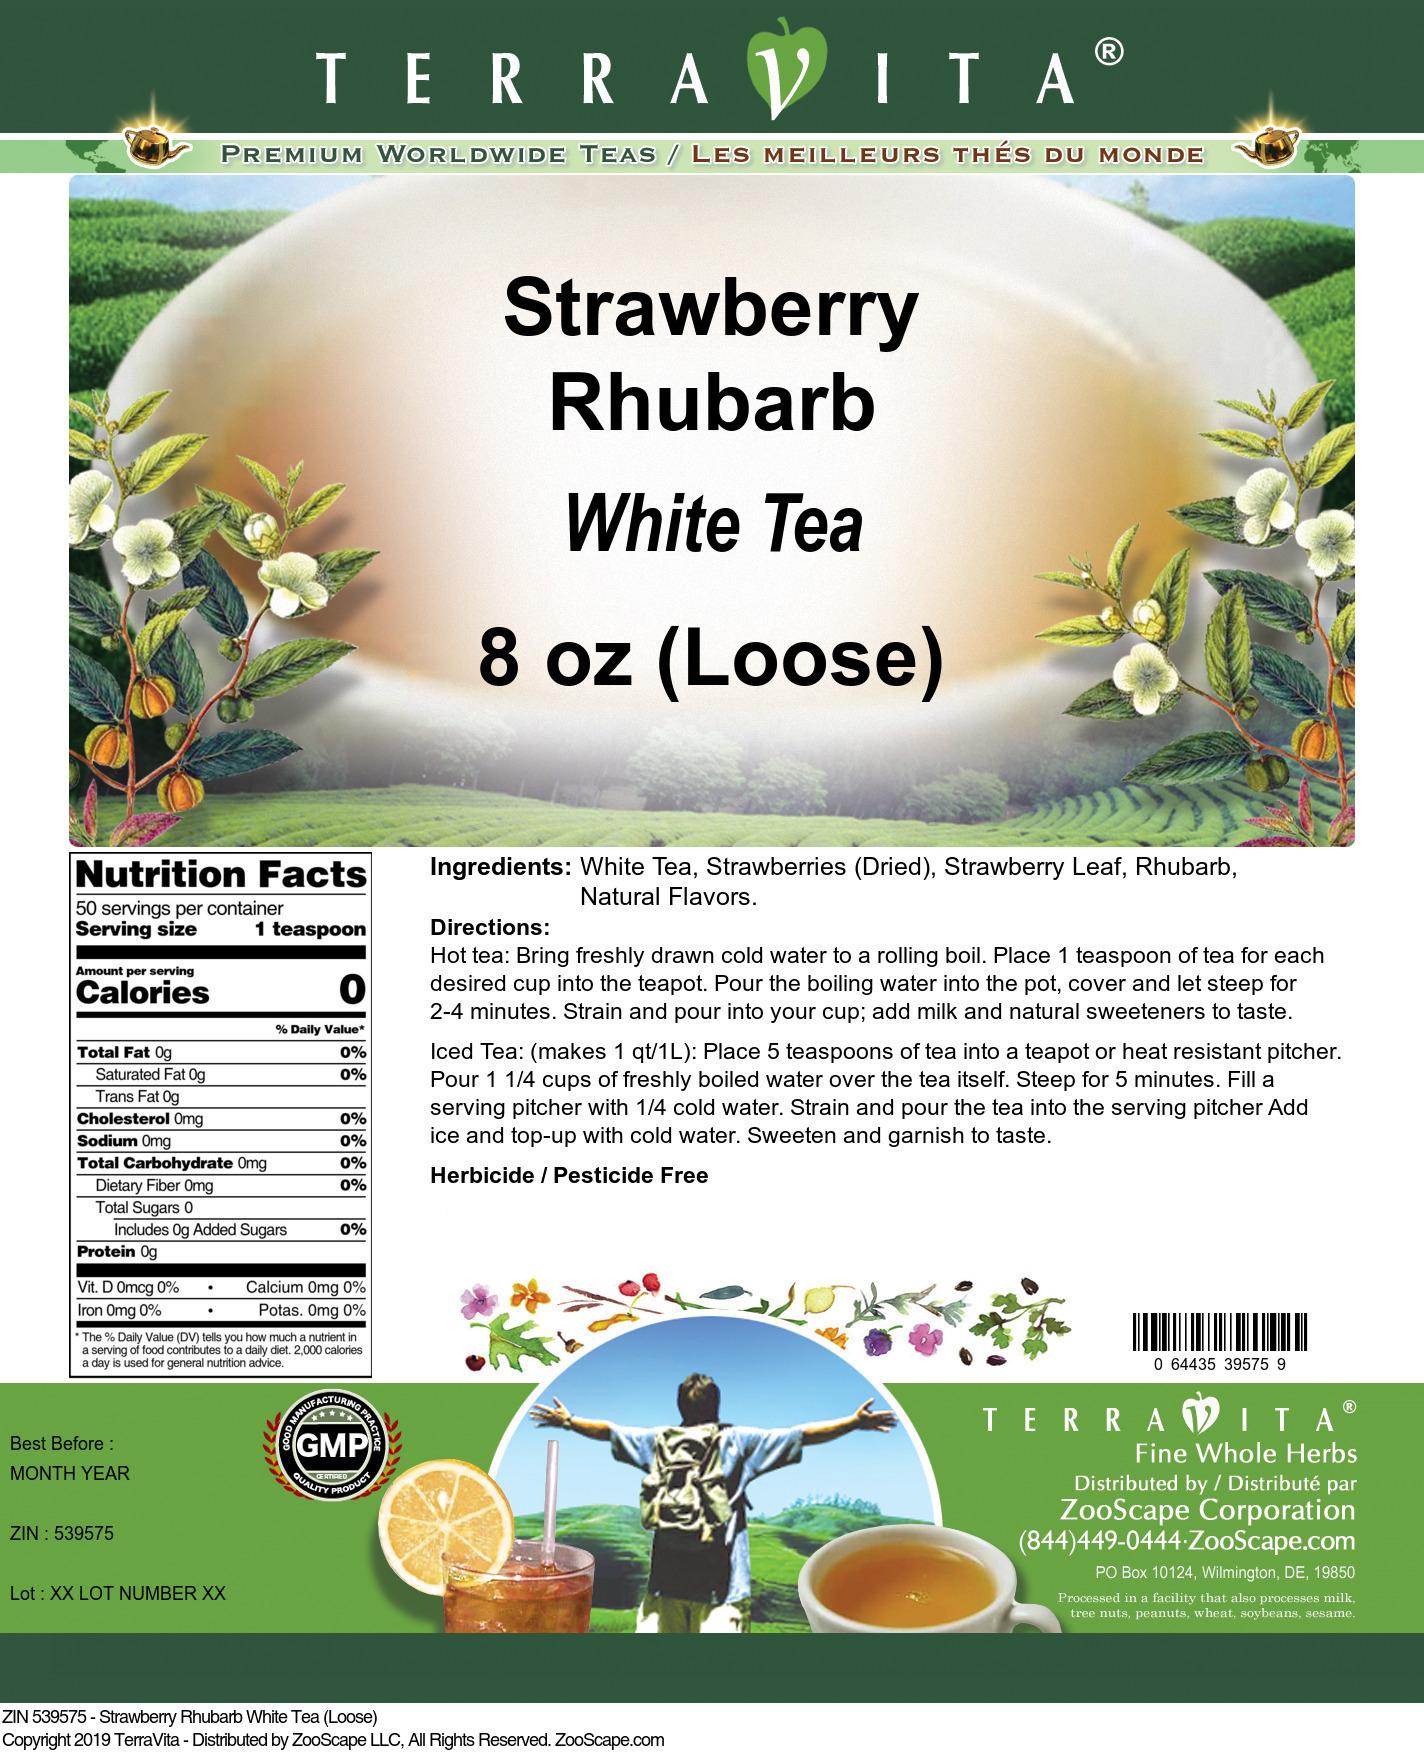 Strawberry Rhubarb White Tea